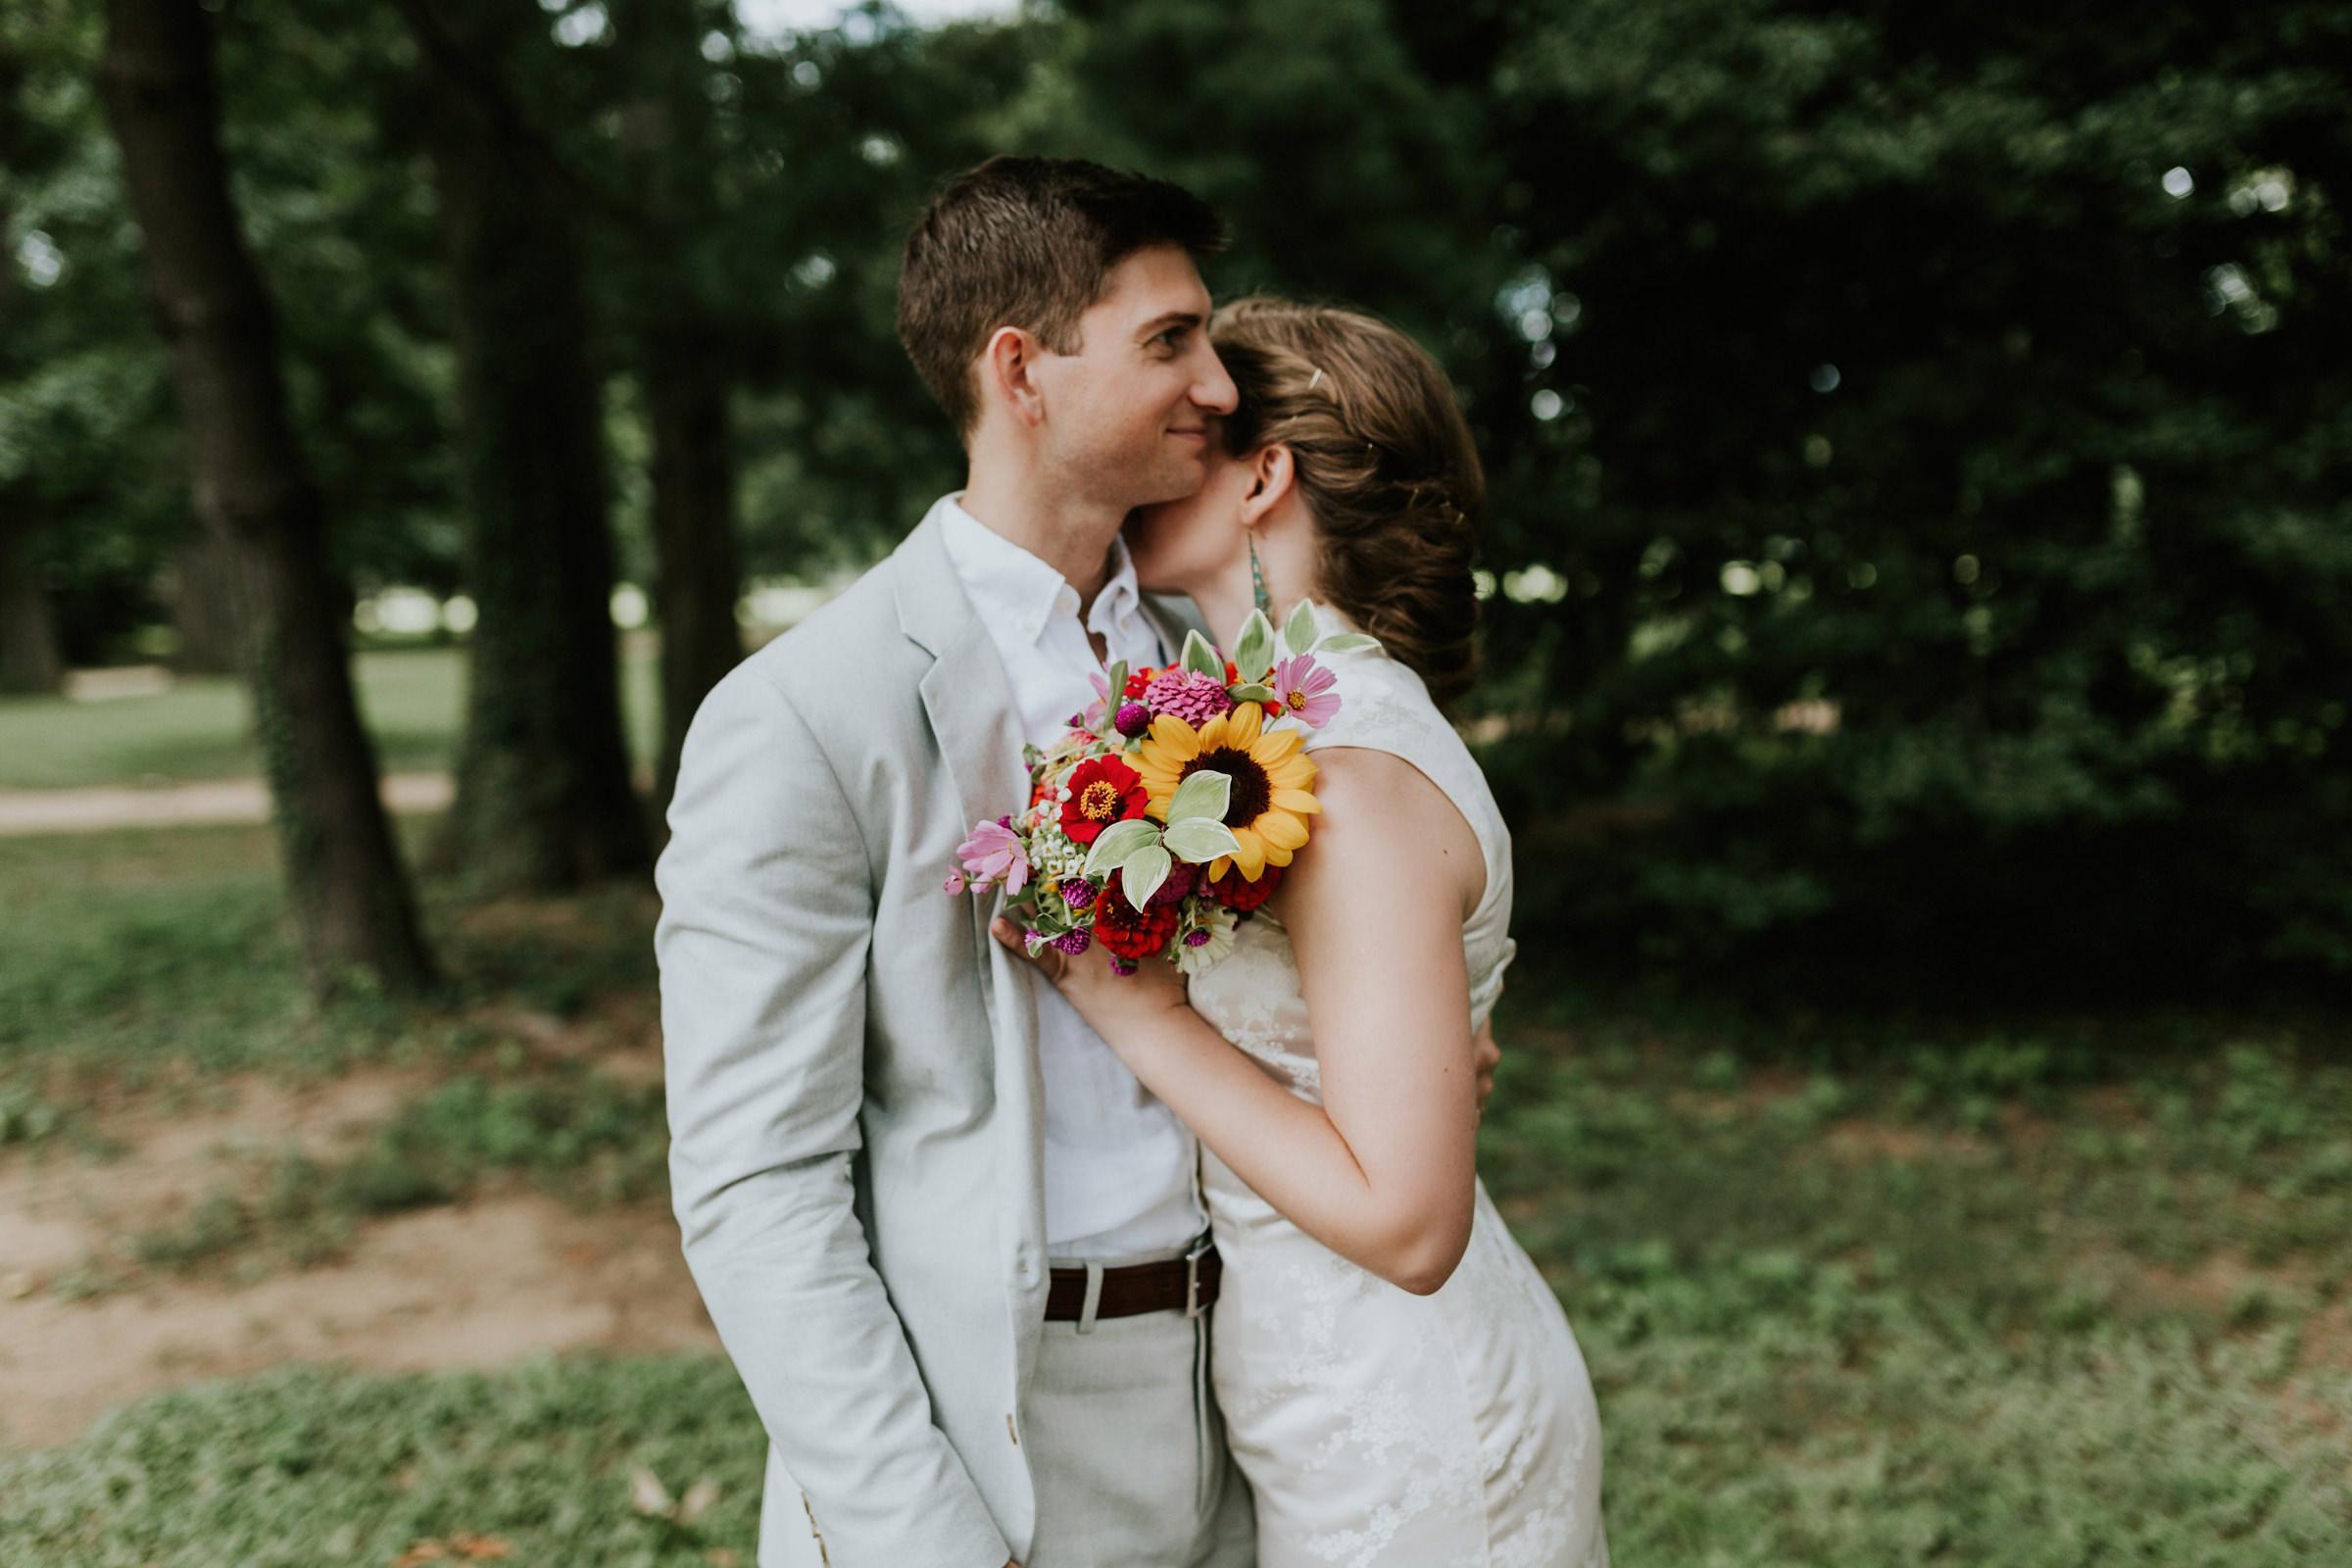 Kentucky_Candid_Wedding_Photographer_167.jpg